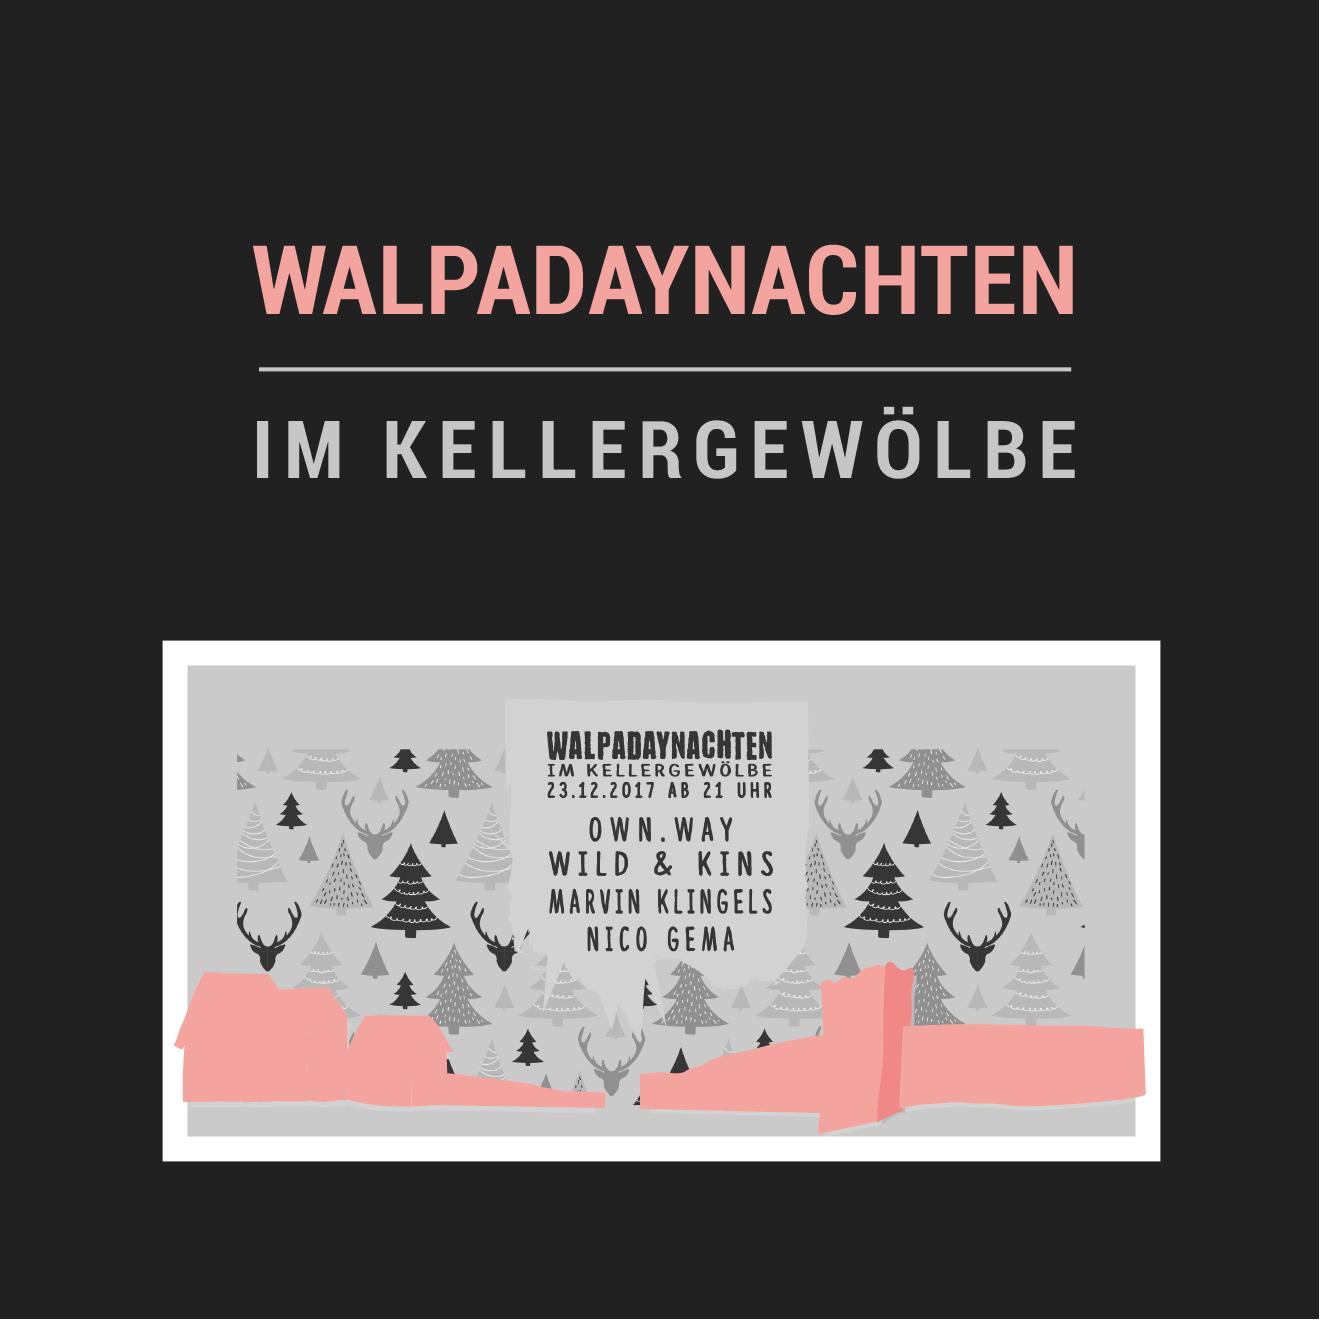 WALPADAYNACHTEN-01